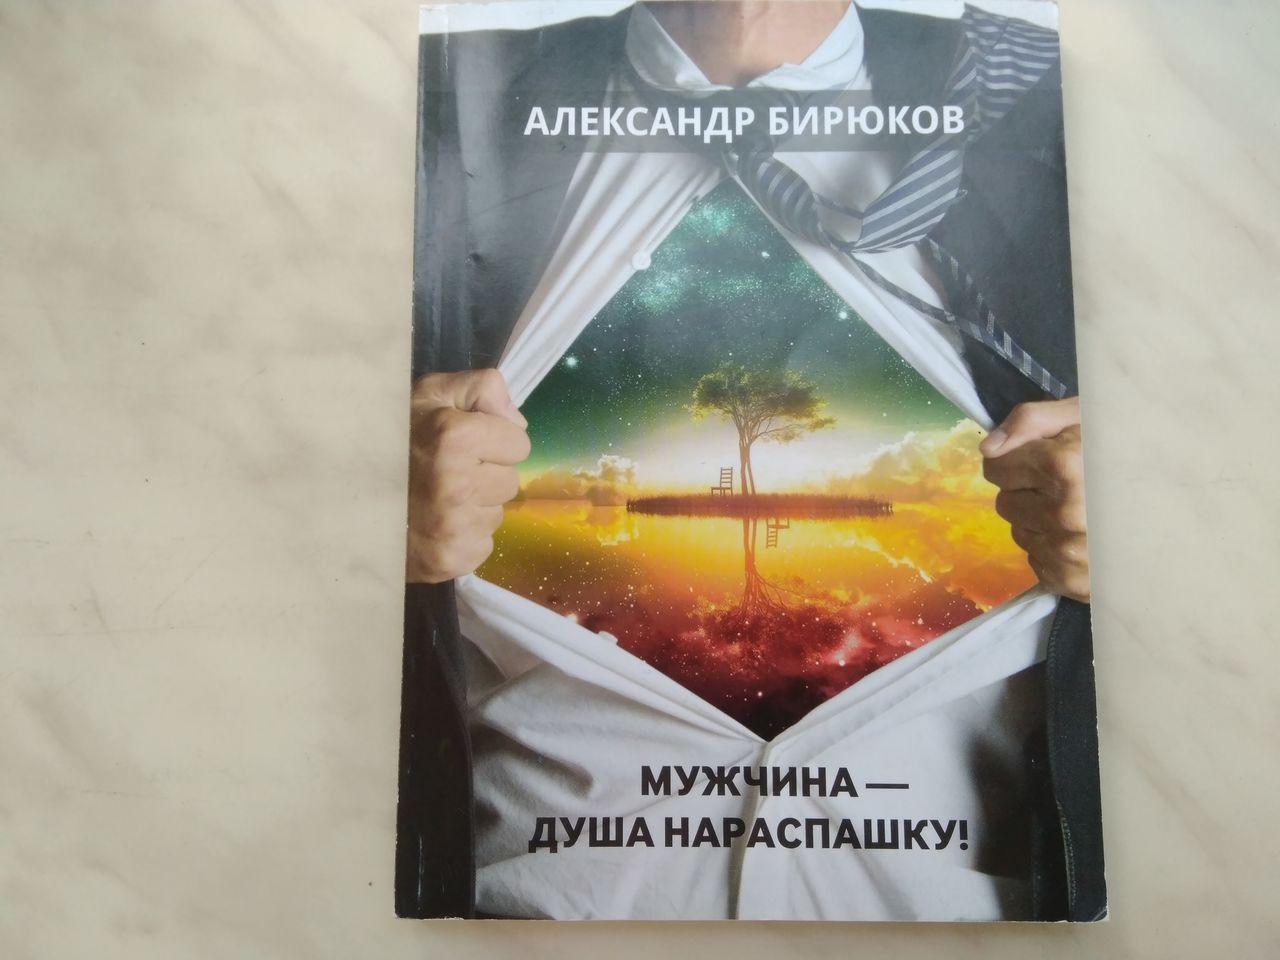 АЛЕКСАНДР БИРЮКОВ МУЖЧИНА ДУША НАРАСПАШКУ СКАЧАТЬ БЕСПЛАТНО